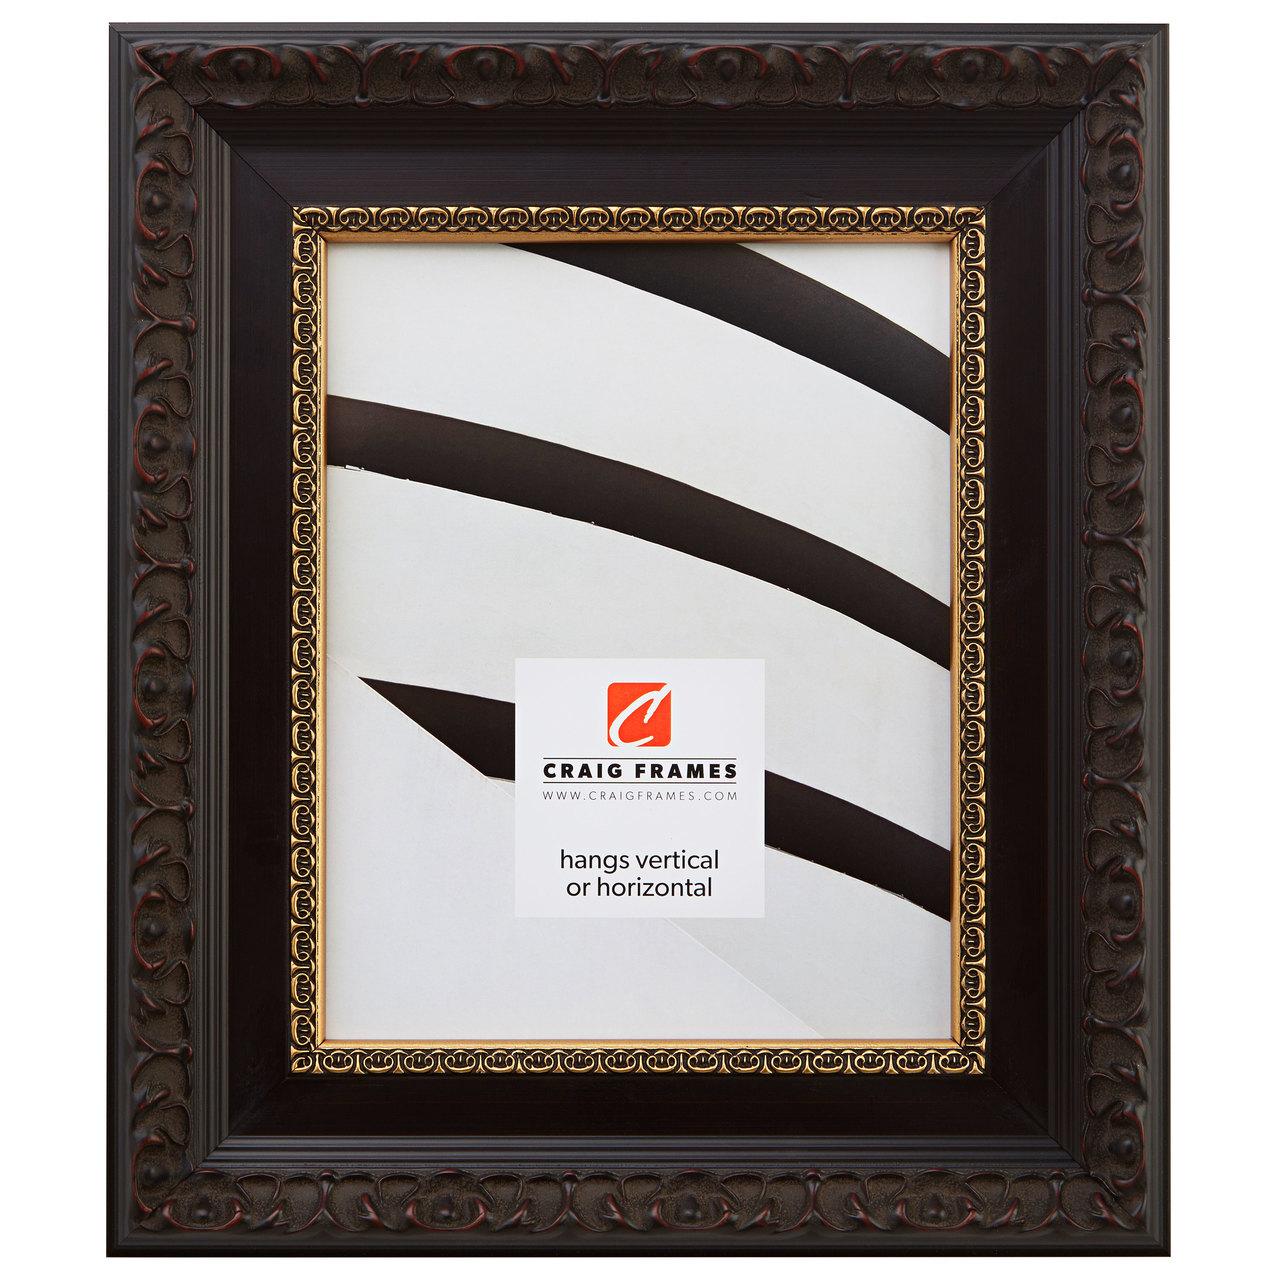 "Devereux 2.5"", Brushed Mahogany Picture Frame"